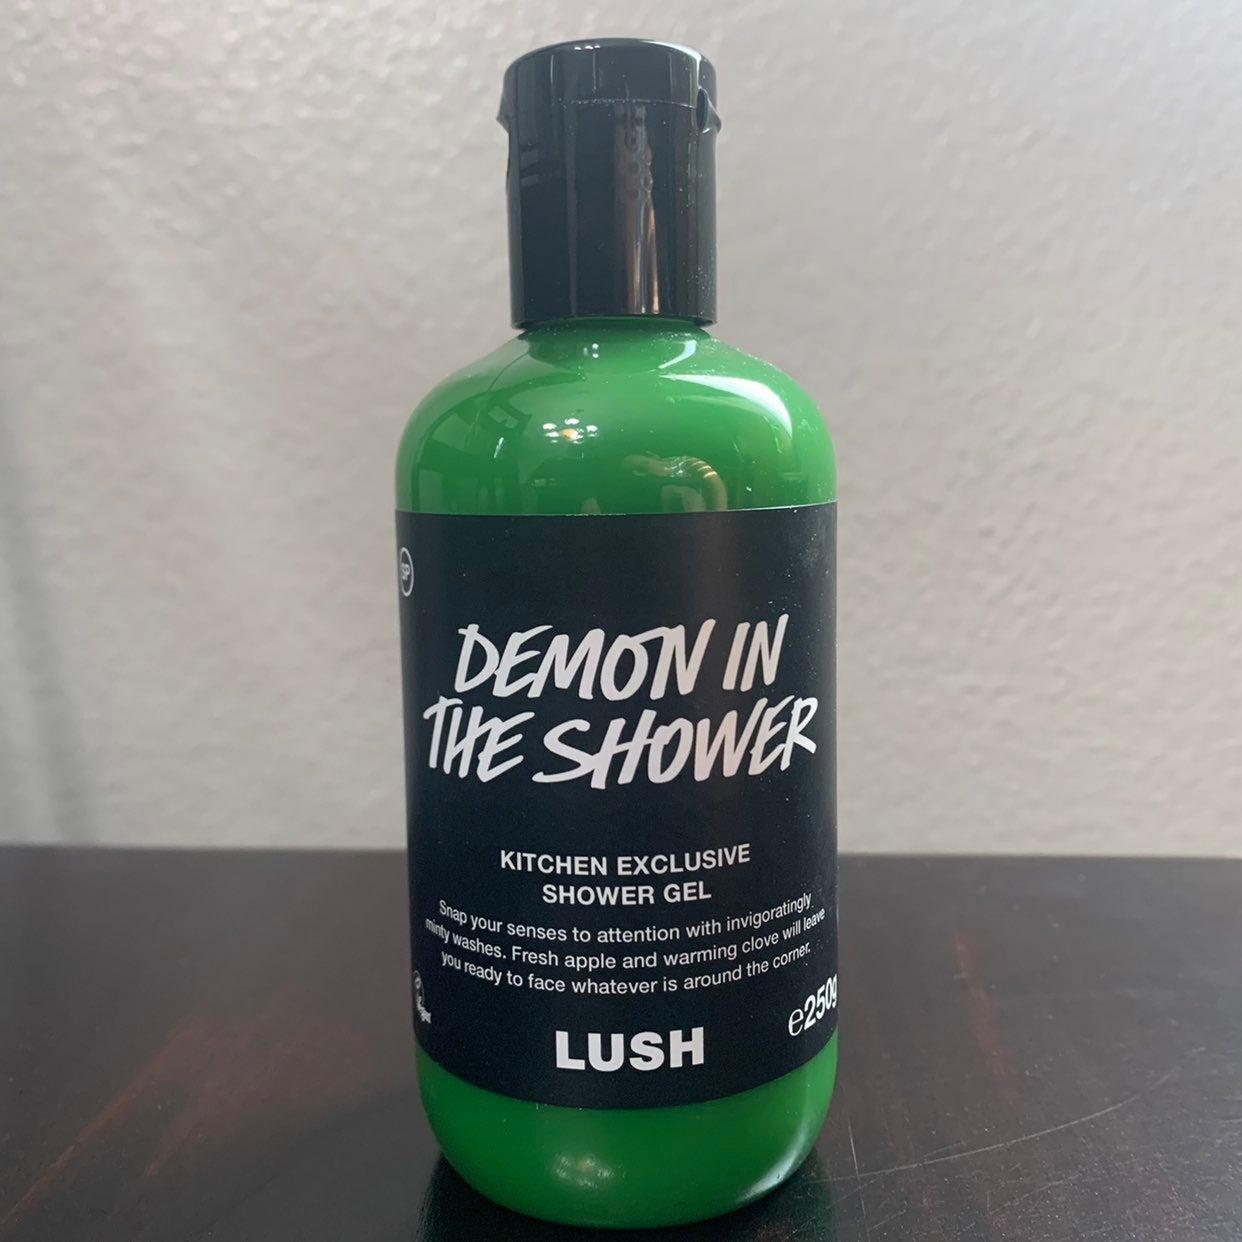 Lush Demon InThe Shower/Boo melts bundle